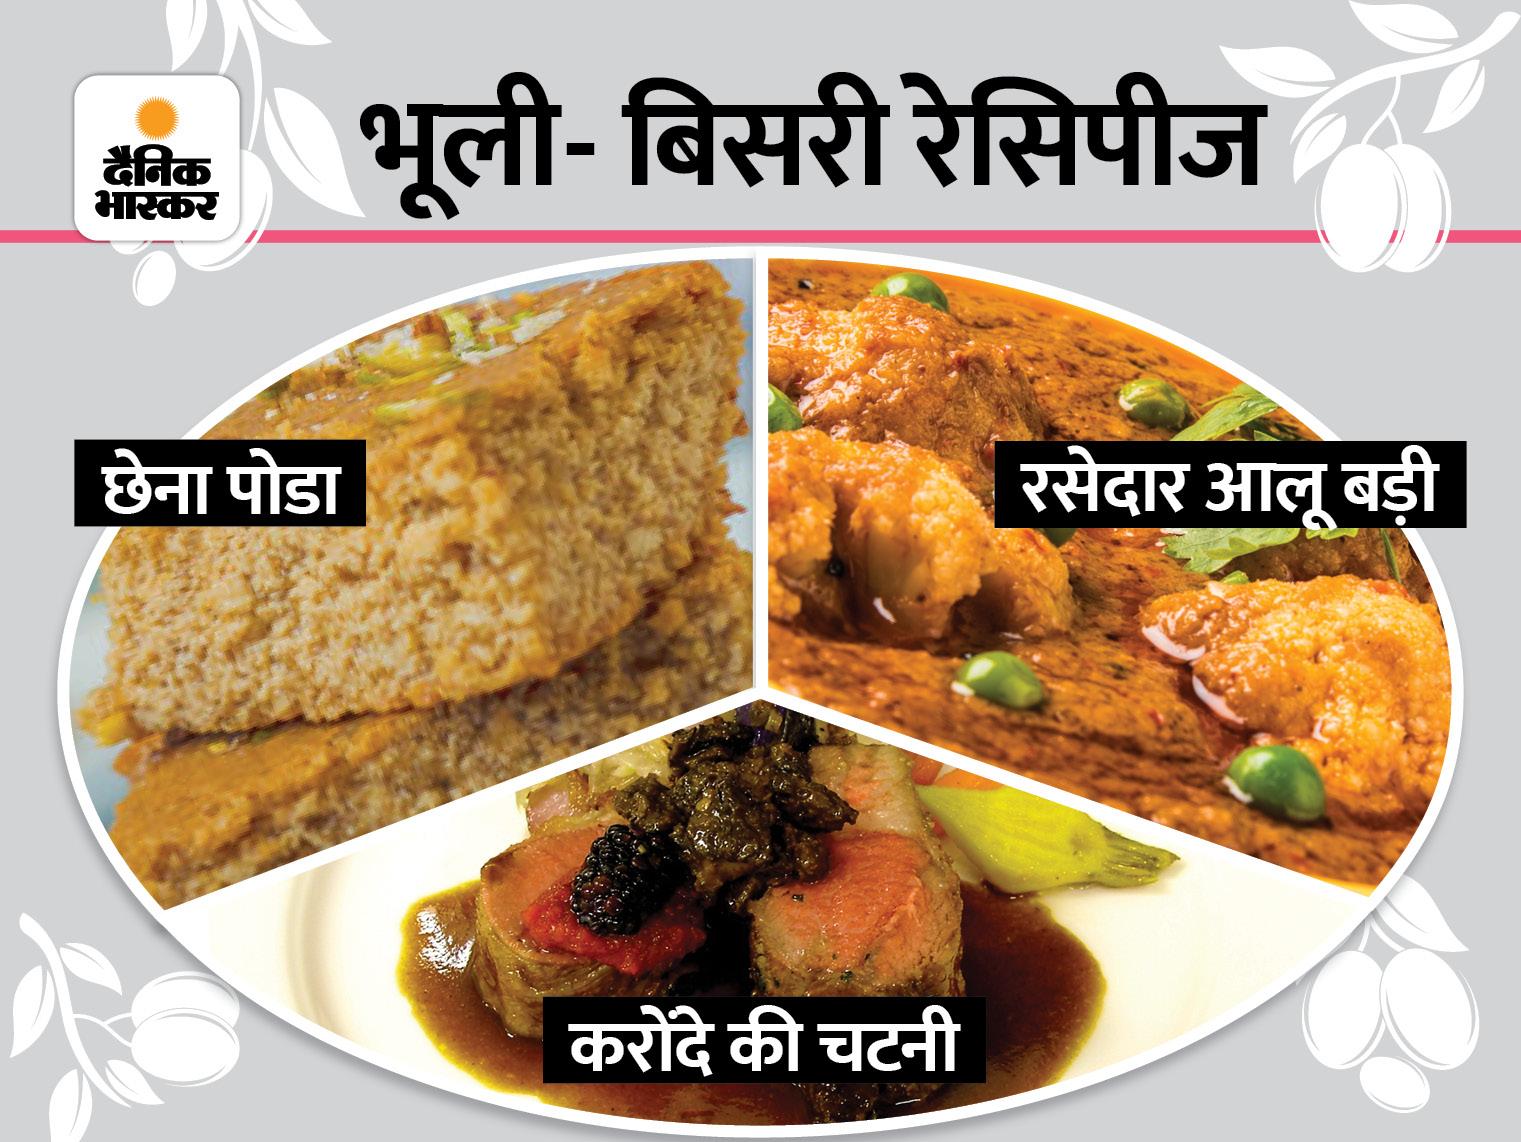 ये तीन भूली-बिसरी रेसिपीज बनाएं, संडे का लुफ्त उठाएं फूड,Food - Dainik Bhaskar